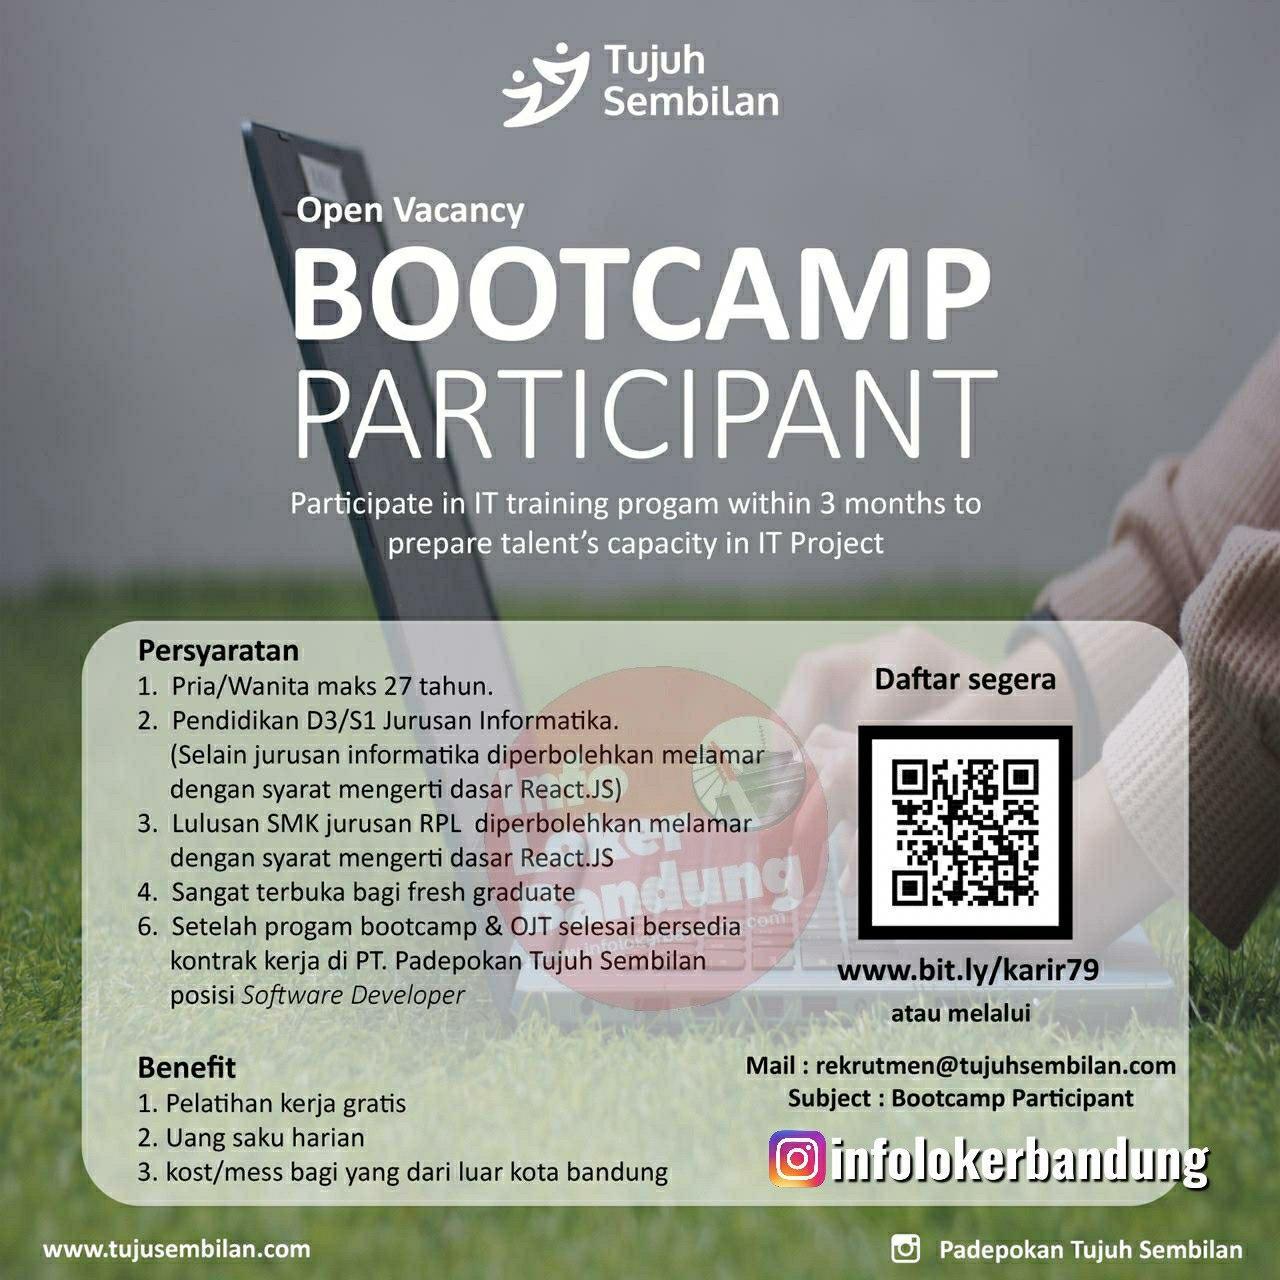 Lowongan Kerja Bootcamp Participant PT. Padepokan Tujuh Sembilan Bandung Mei 2020